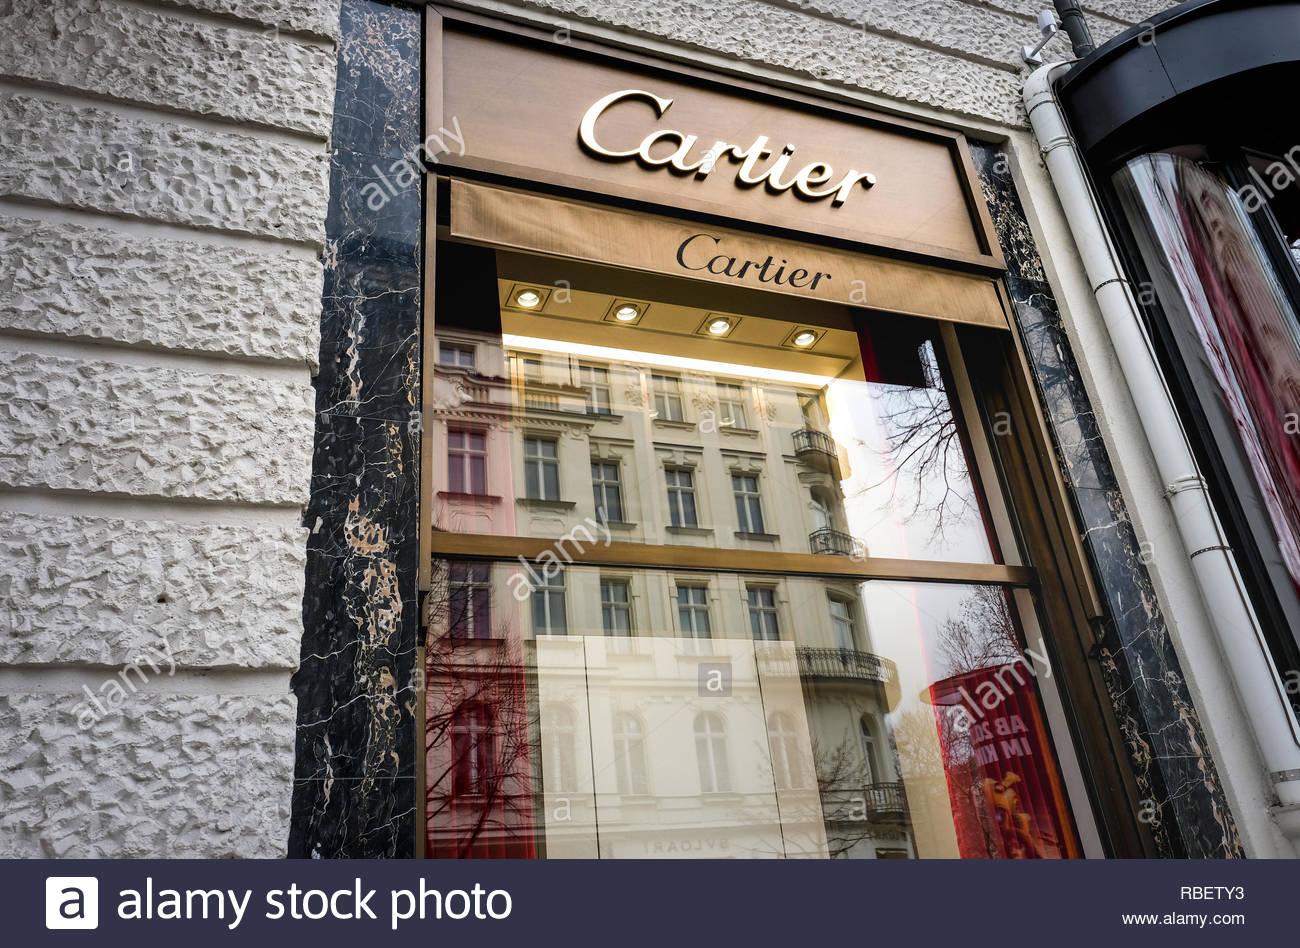 6e7d56911778 Cartier Retail Store Imágenes De Stock & Cartier Retail Store Fotos ...